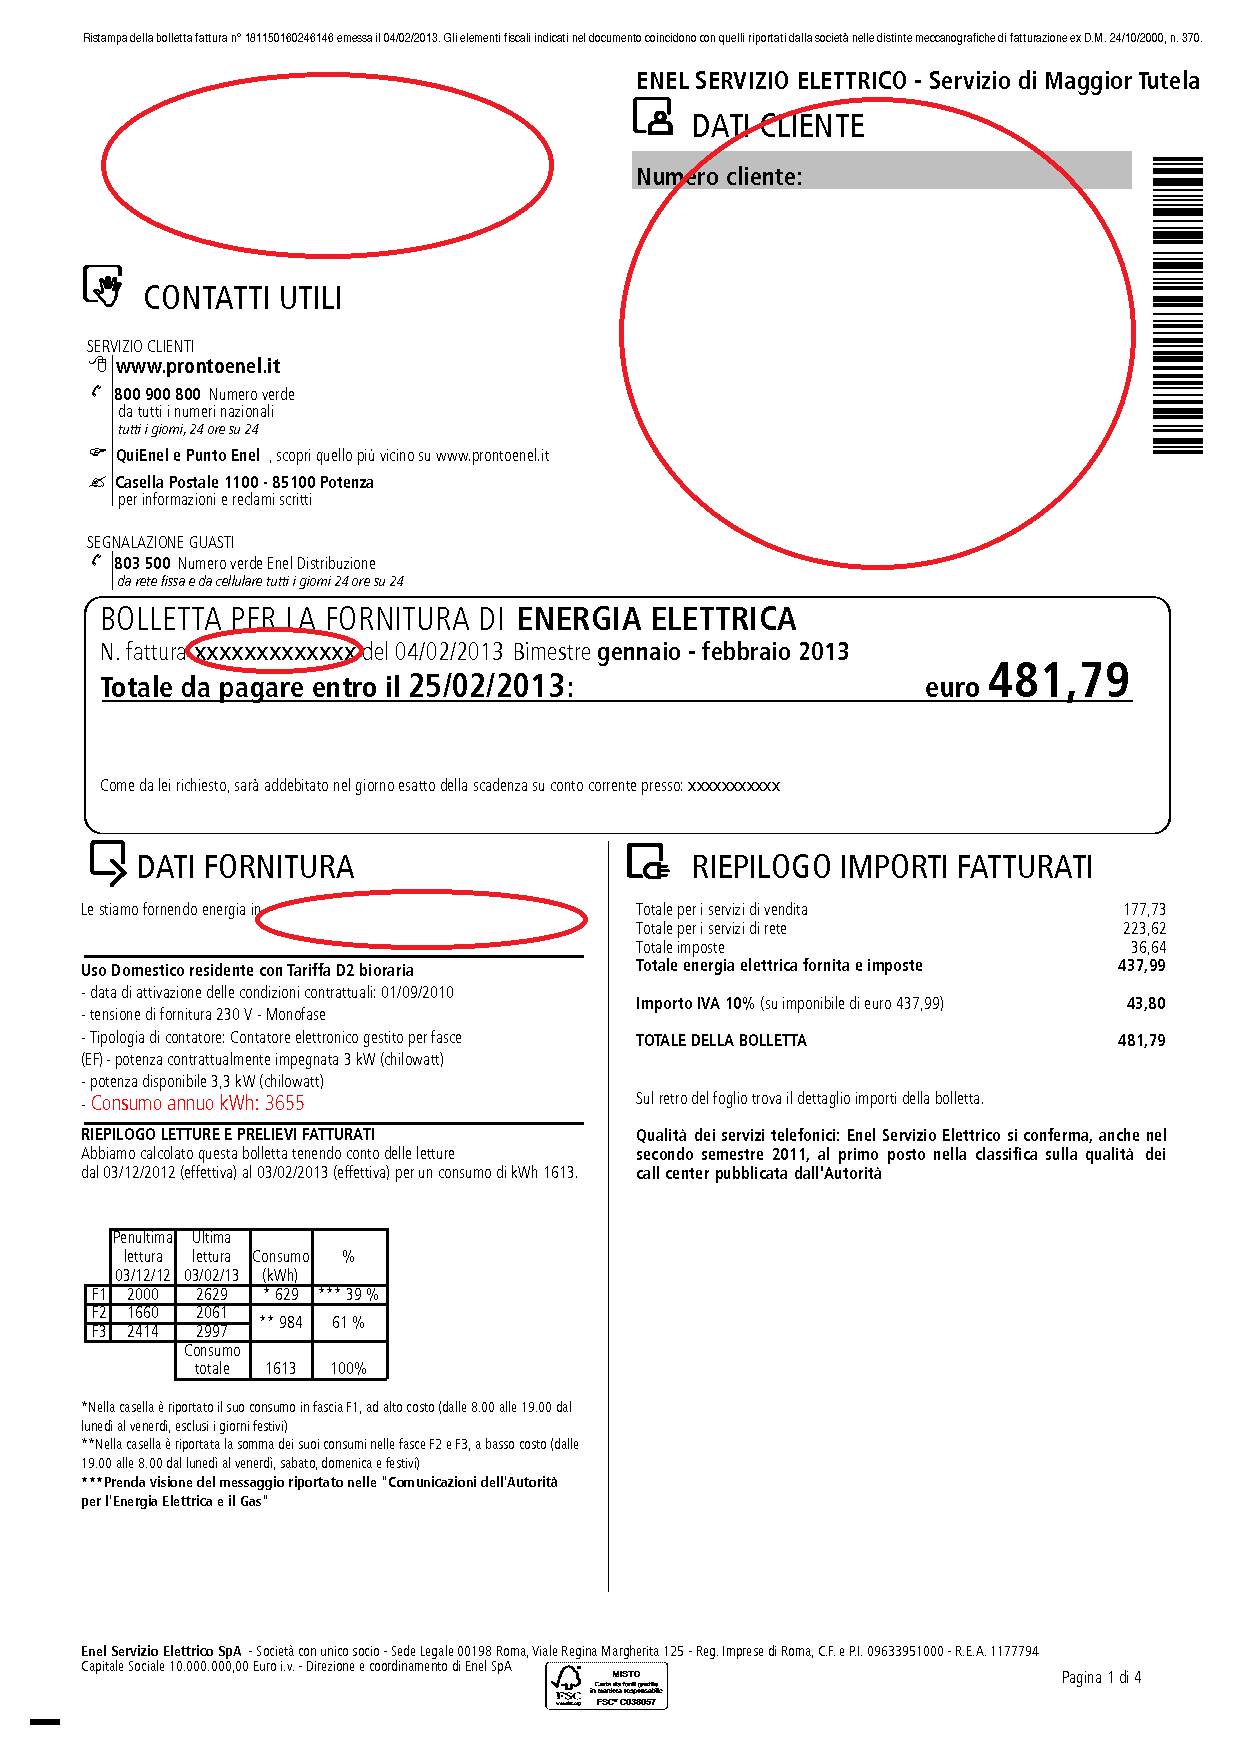 bollette enel pdf